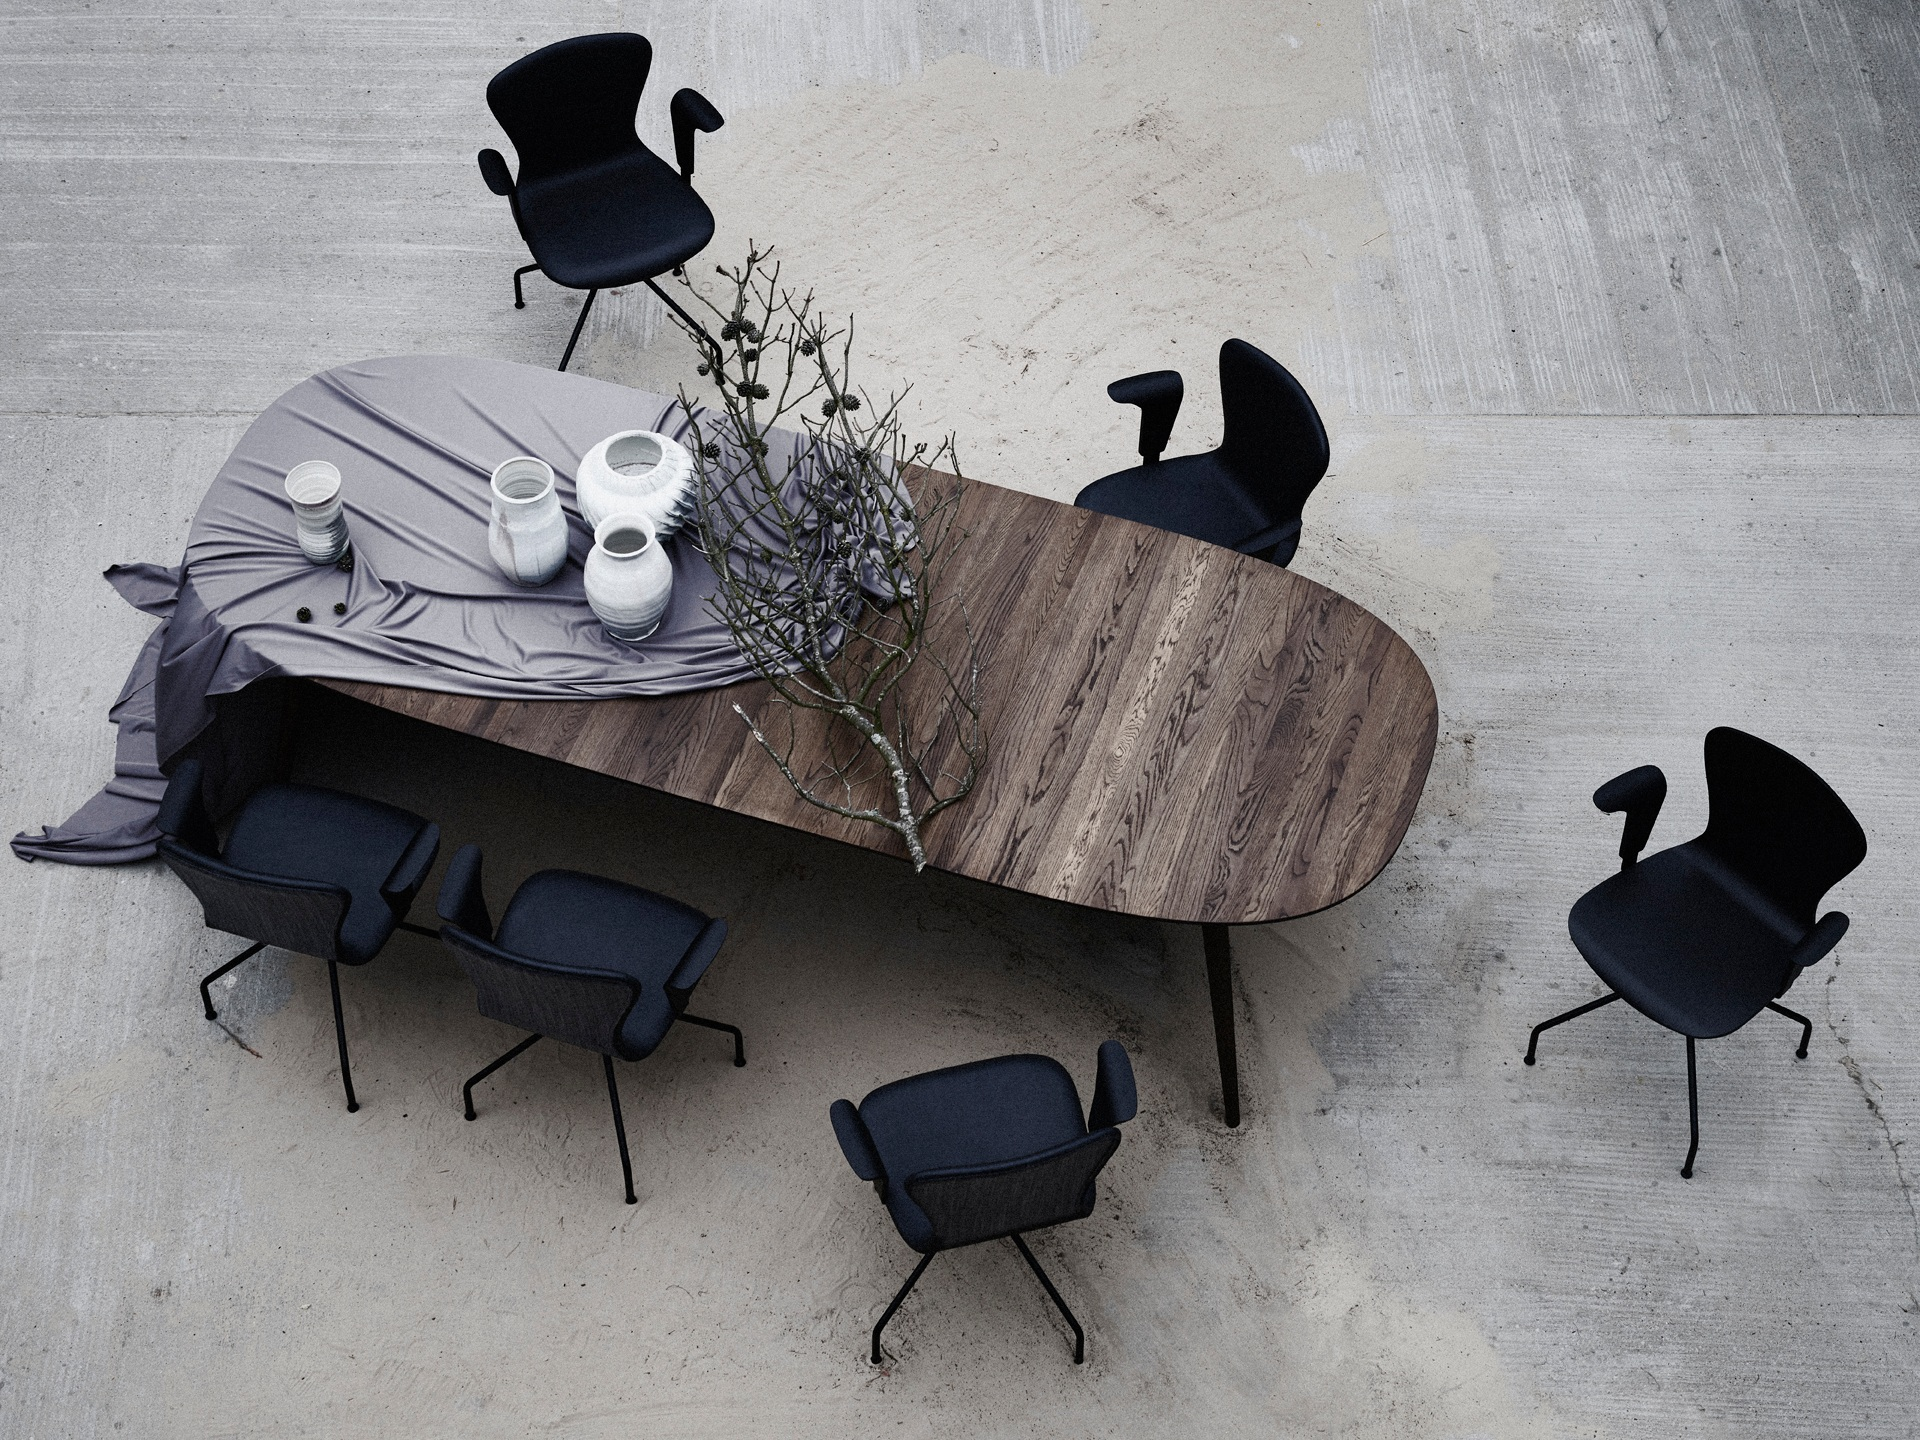 AW18 Setup 6 PLAYdinner Lamé Table, PLAYchair Swing-LowRes 2.jpg